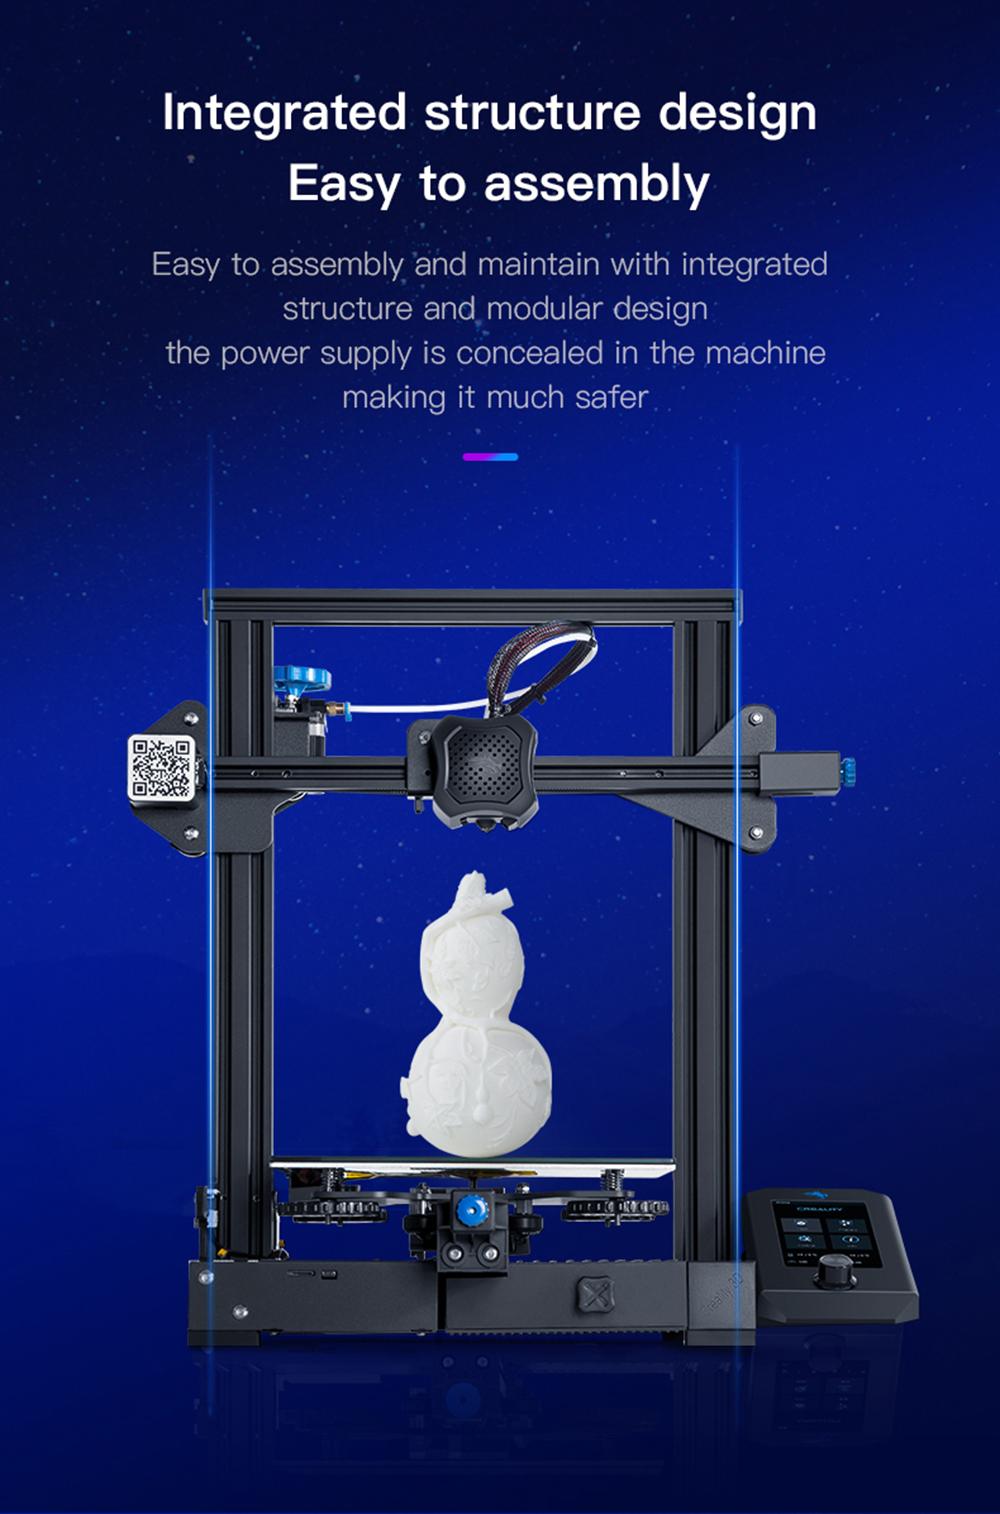 Creality3D Ender 3 V2 3D-Drucker Bausatz - 220x220x250mm - Einfacher Aufbau